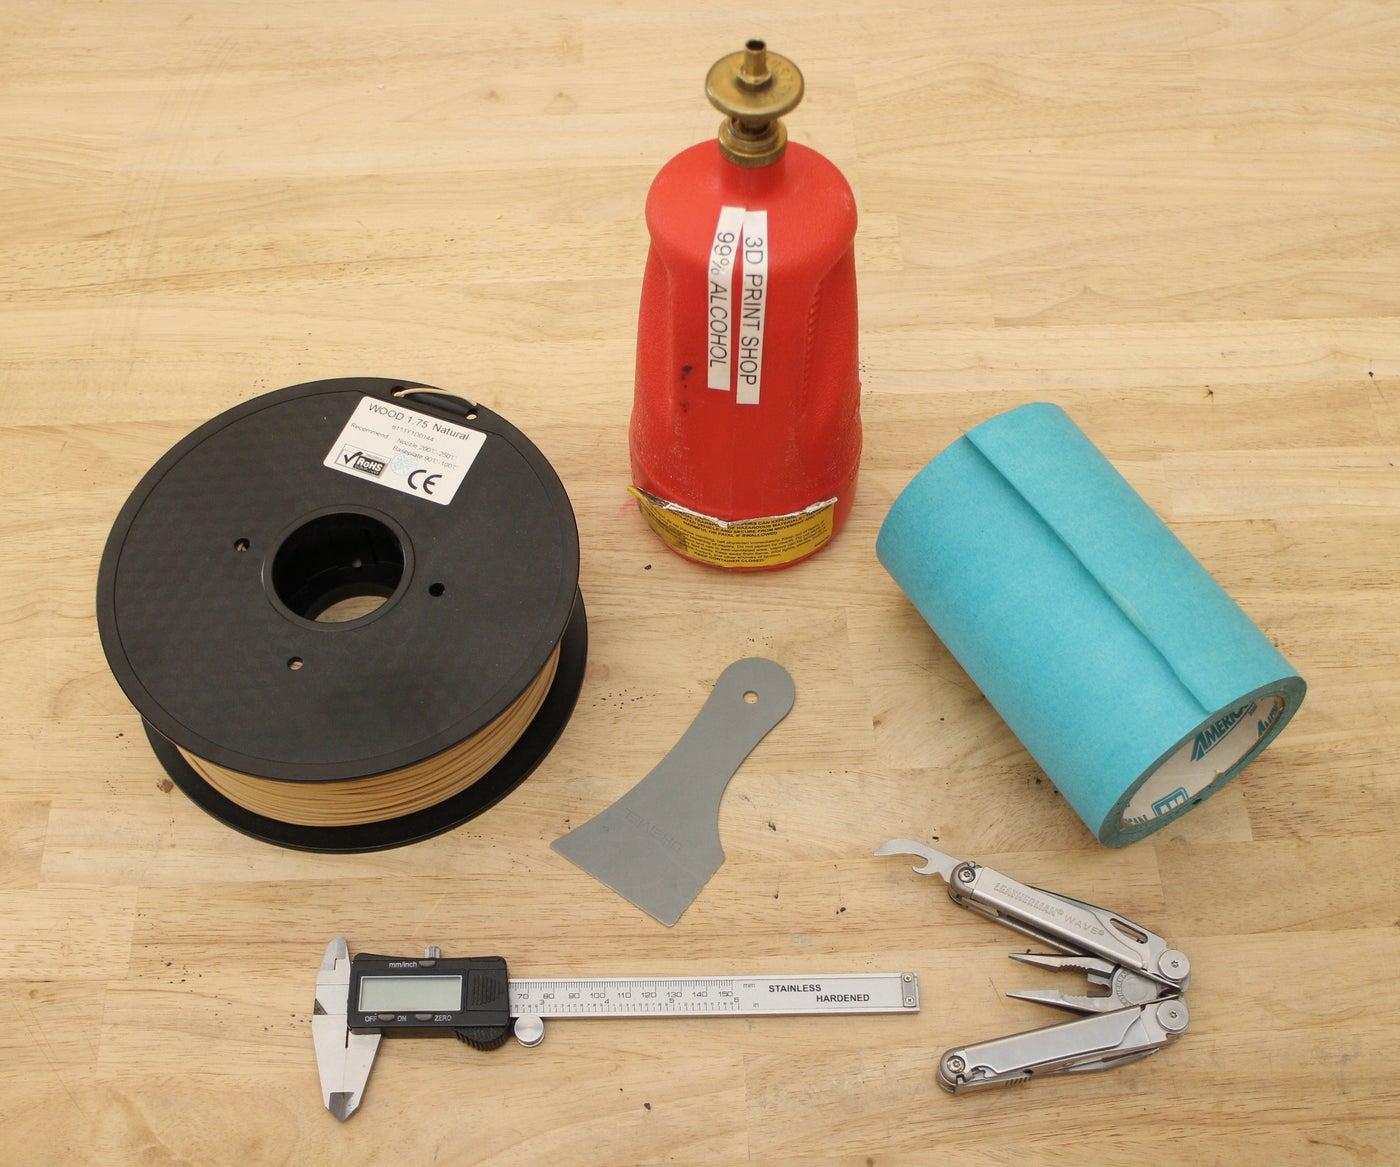 Tools + Materials for 3D Printing